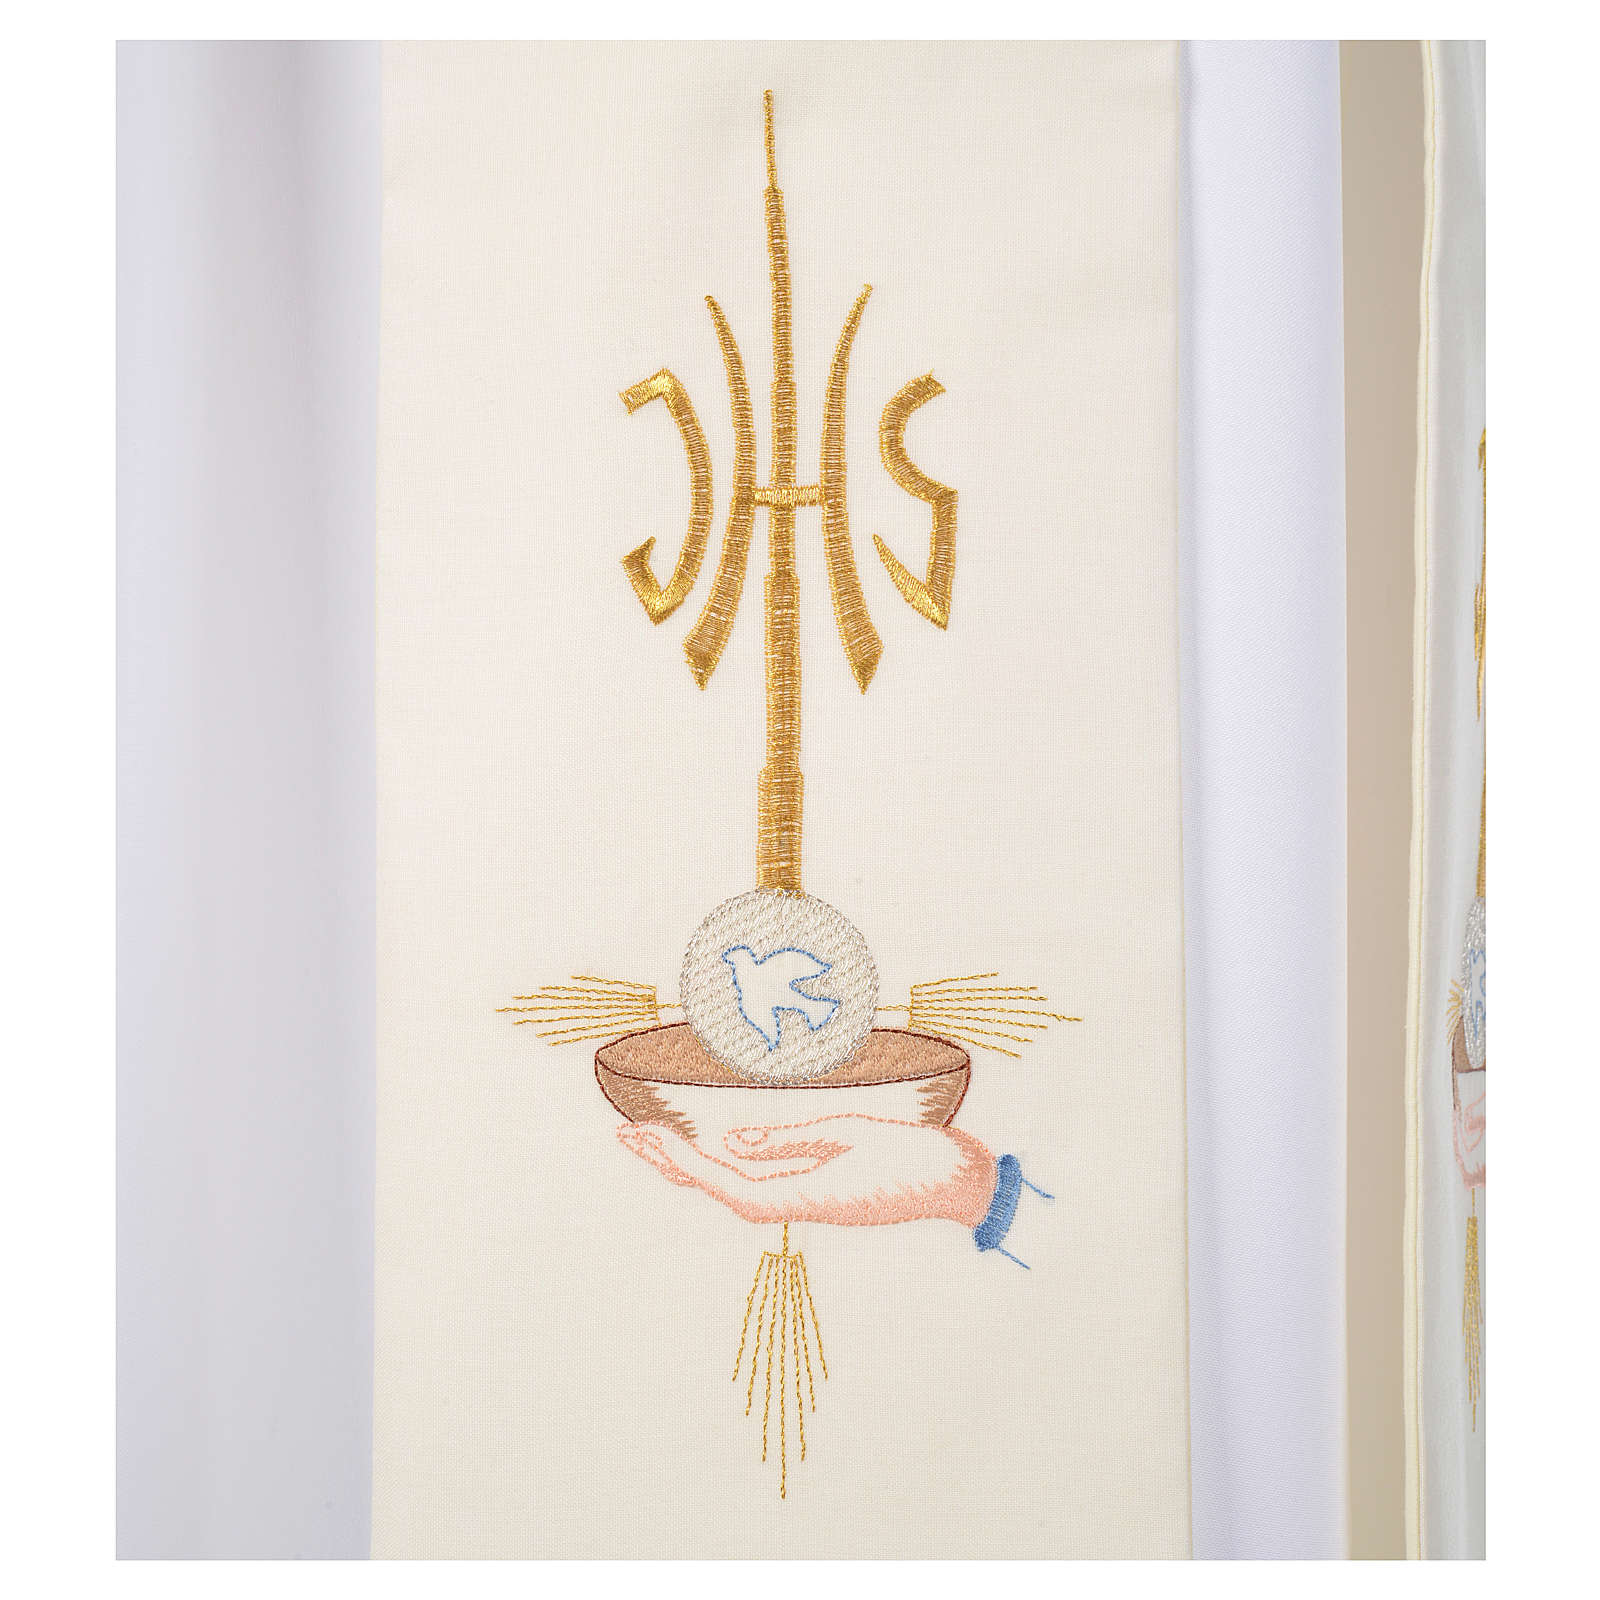 Stola diaconale mani patena ostia colomba JHS 4